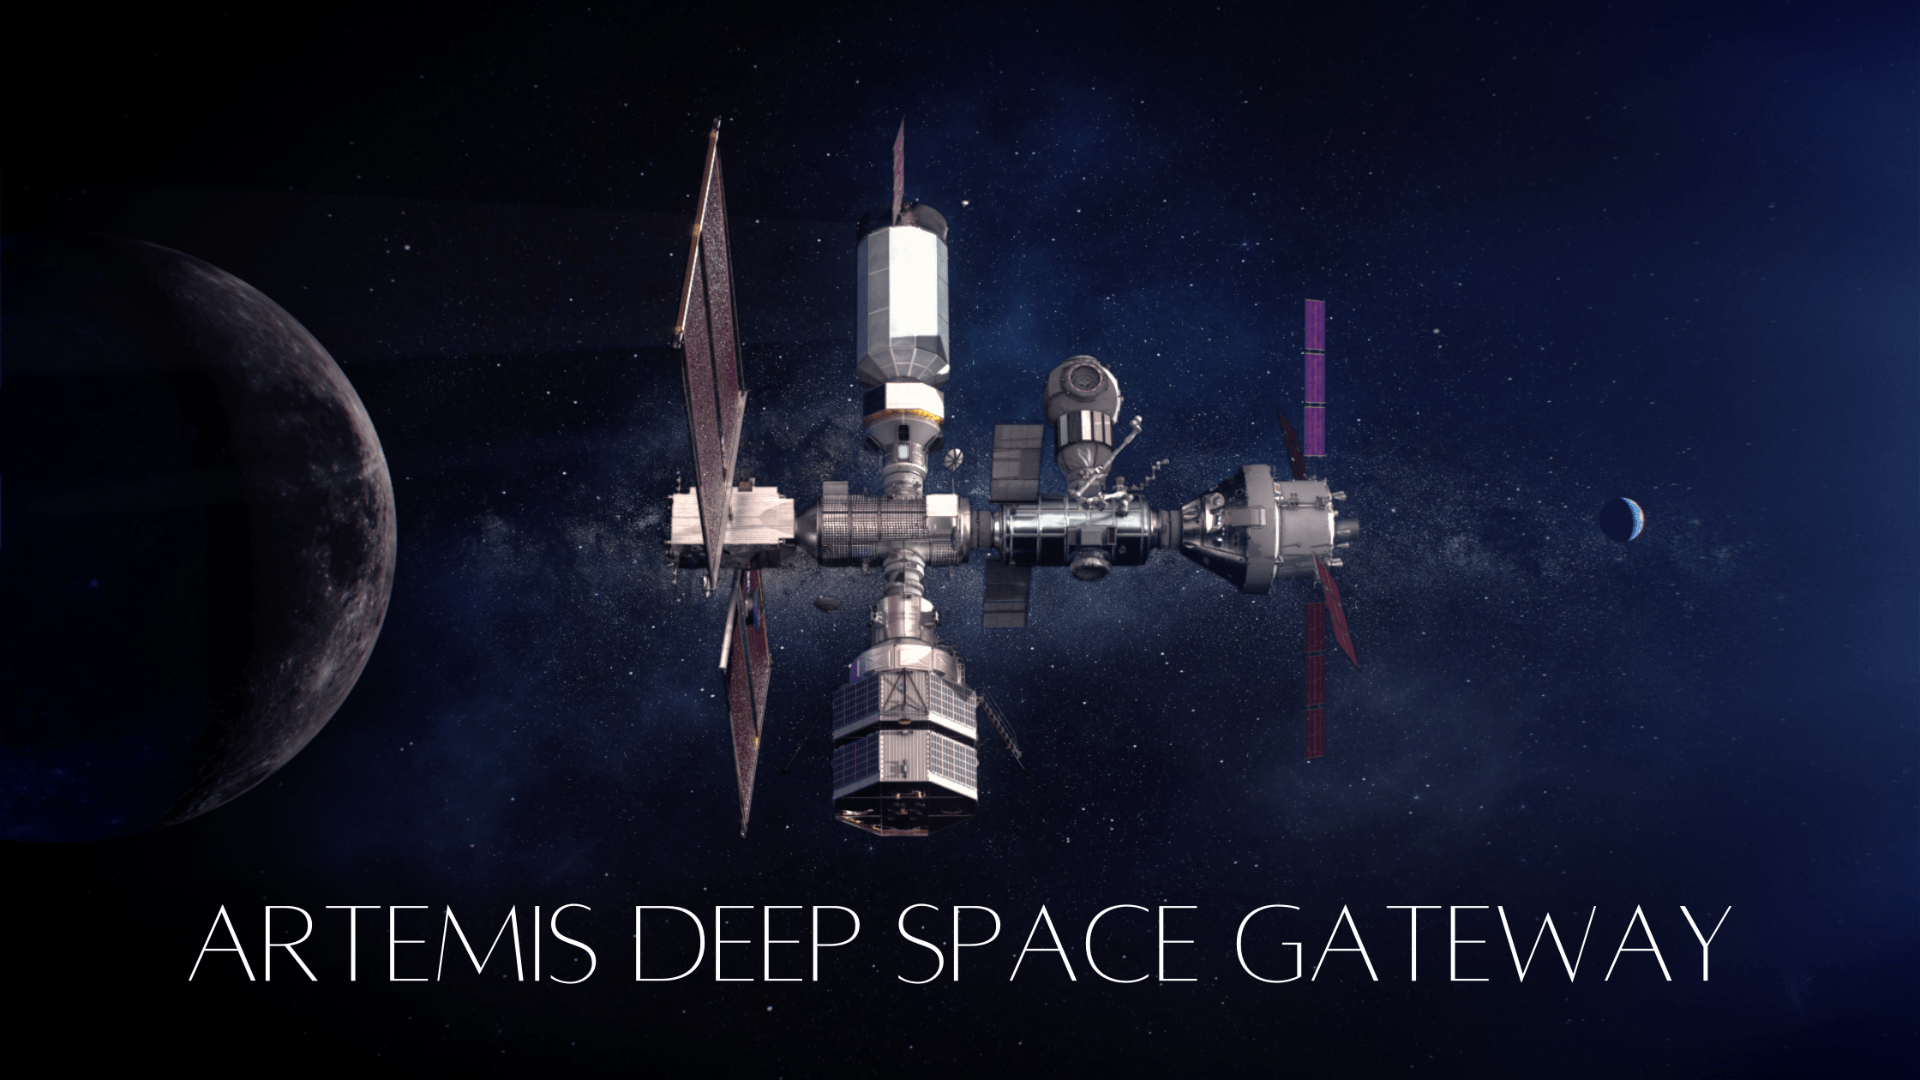 Artist concept of Artemis Gateway